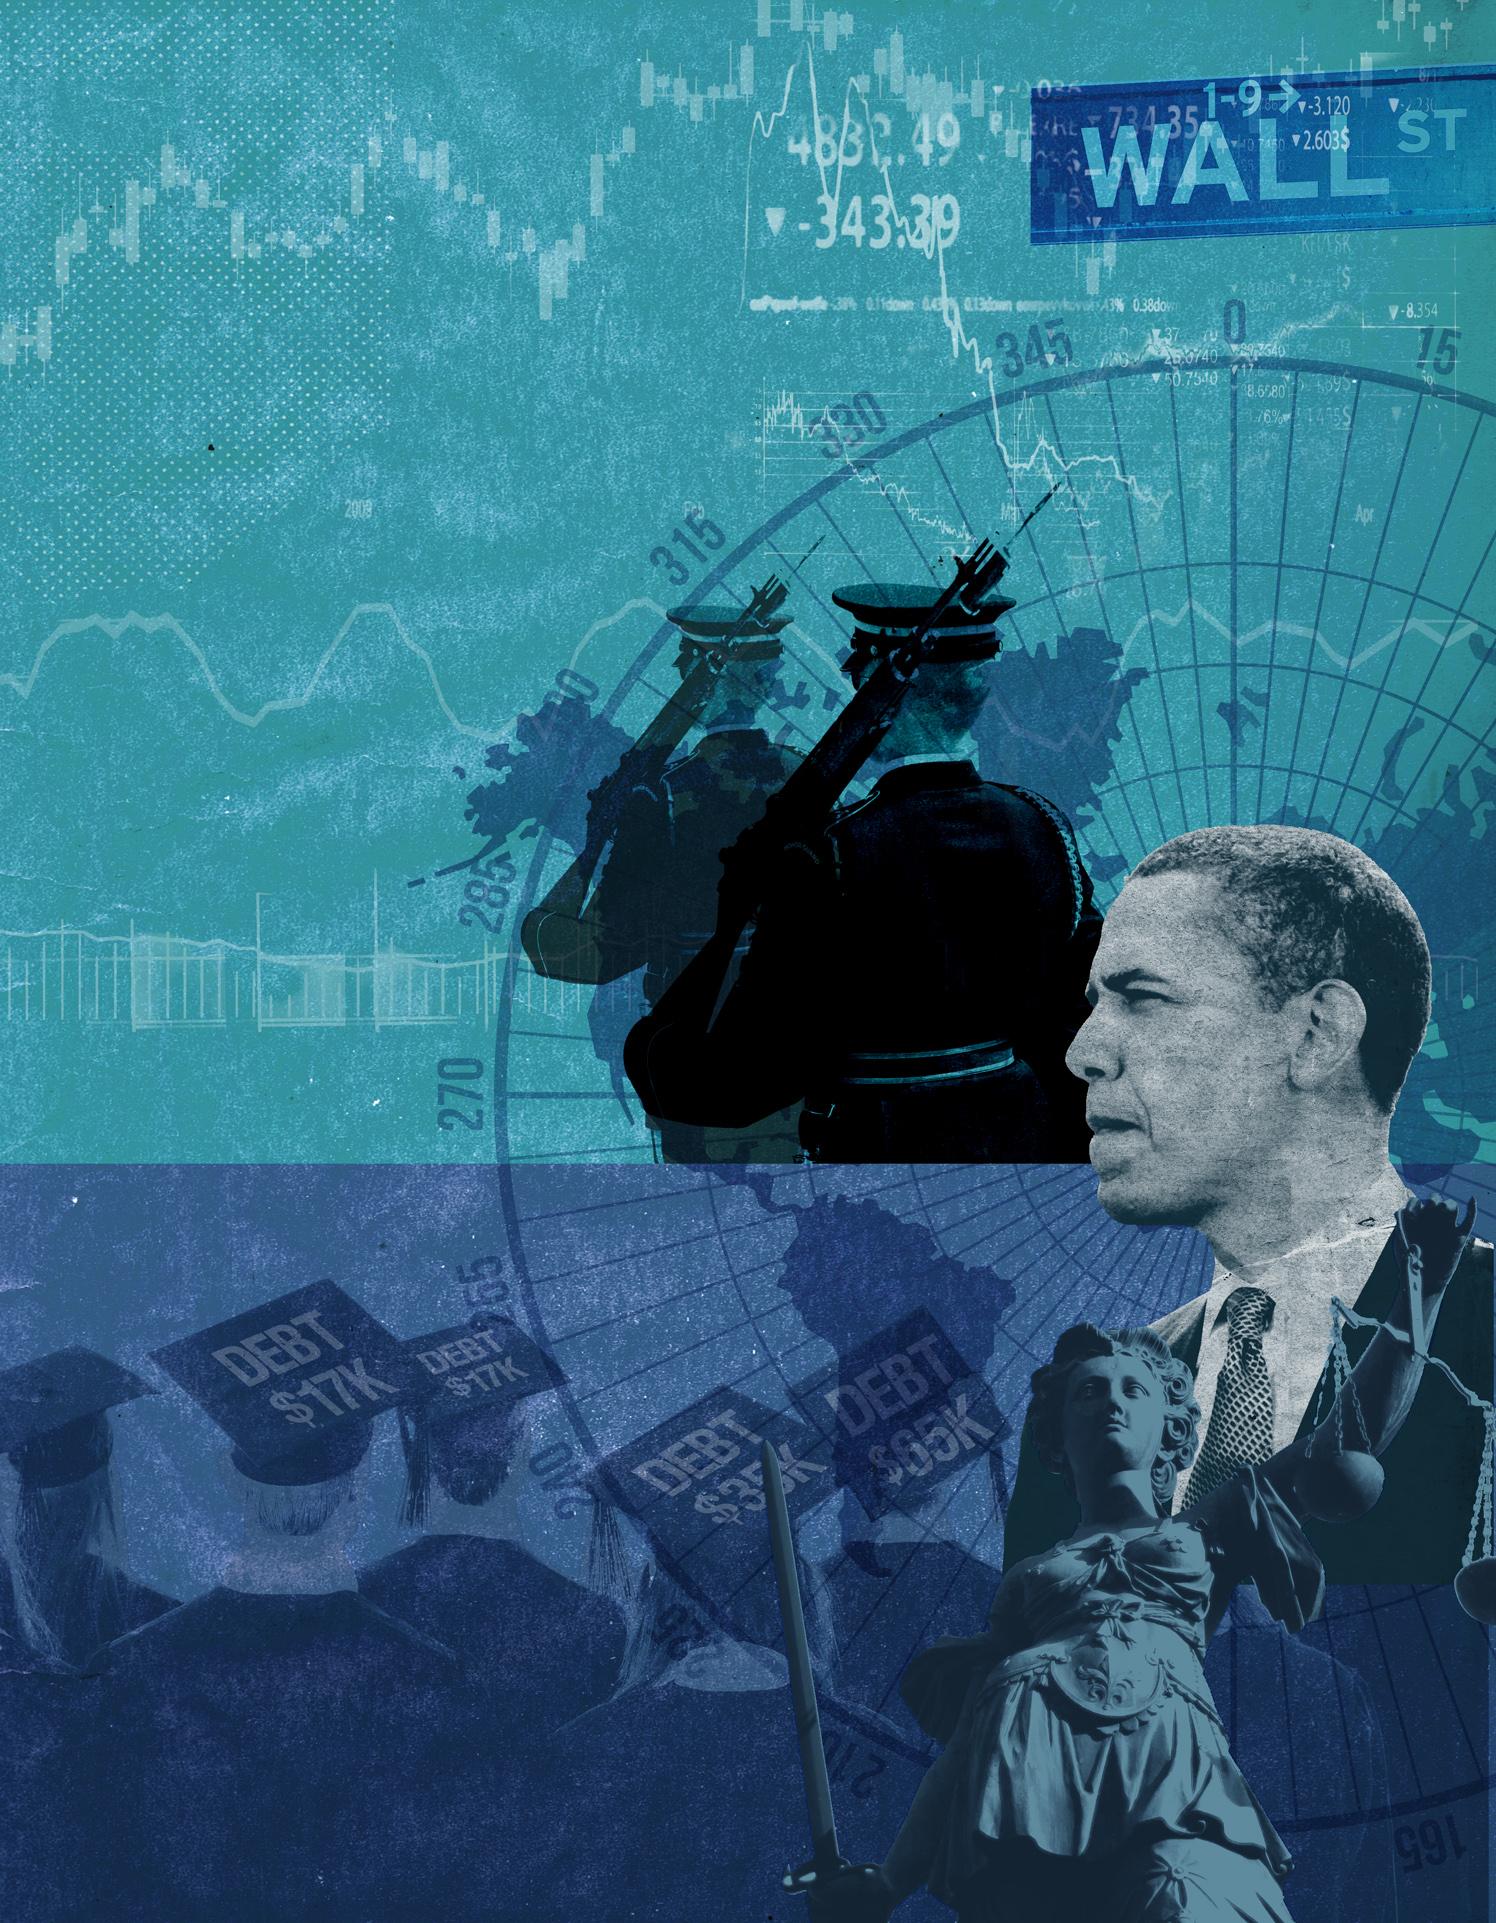 America Justice System Student Debt Economy The Economist